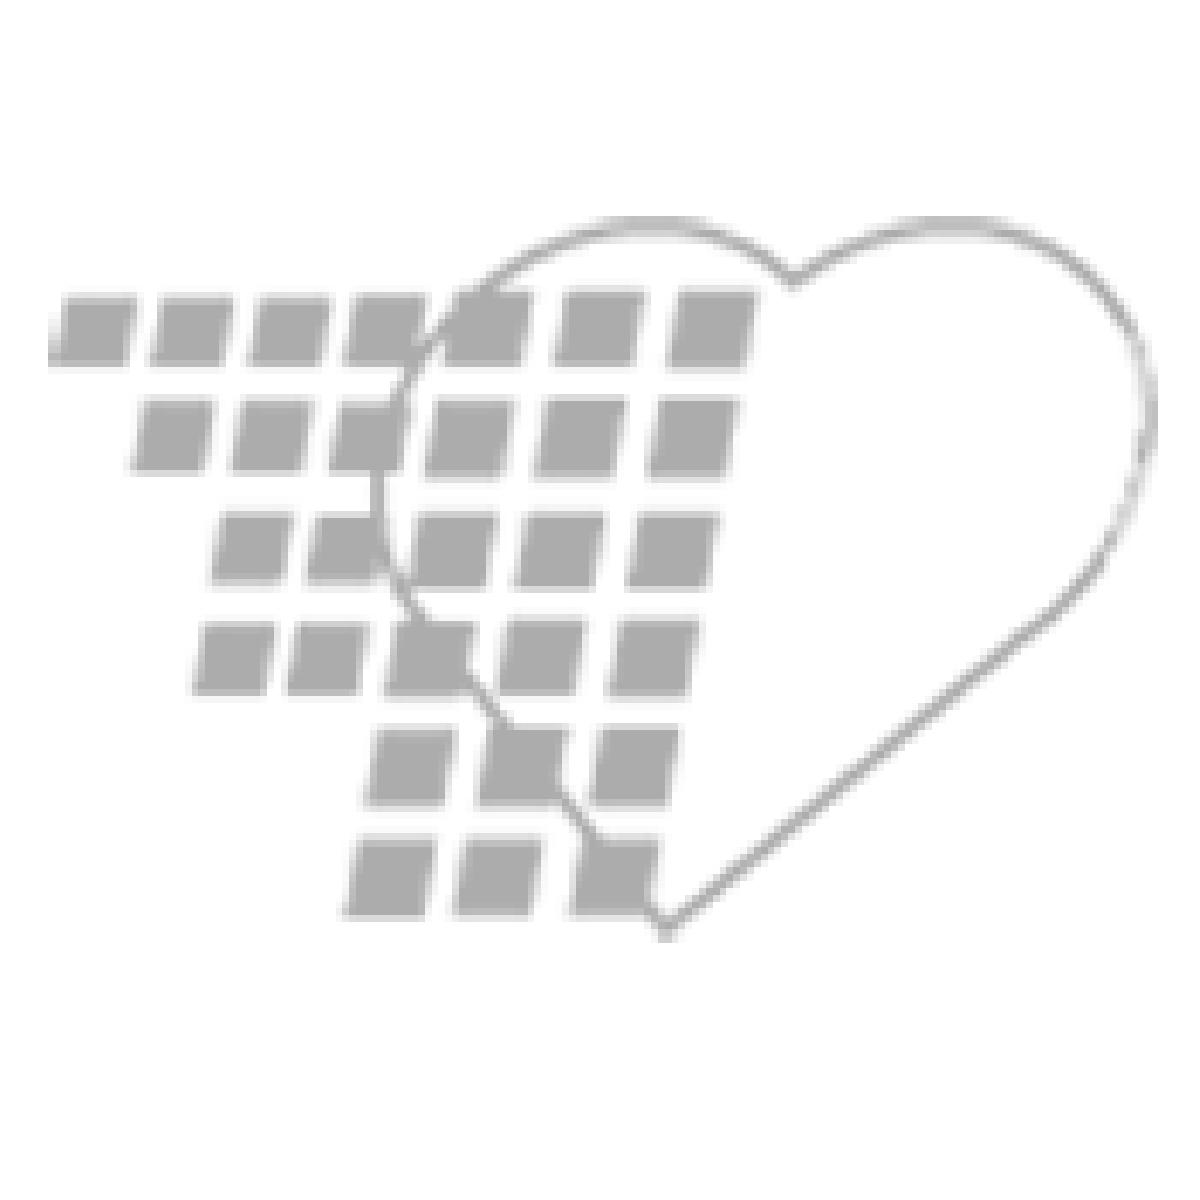 04-25-3124 SimCartRx™ Basic Mobile Charting Cart